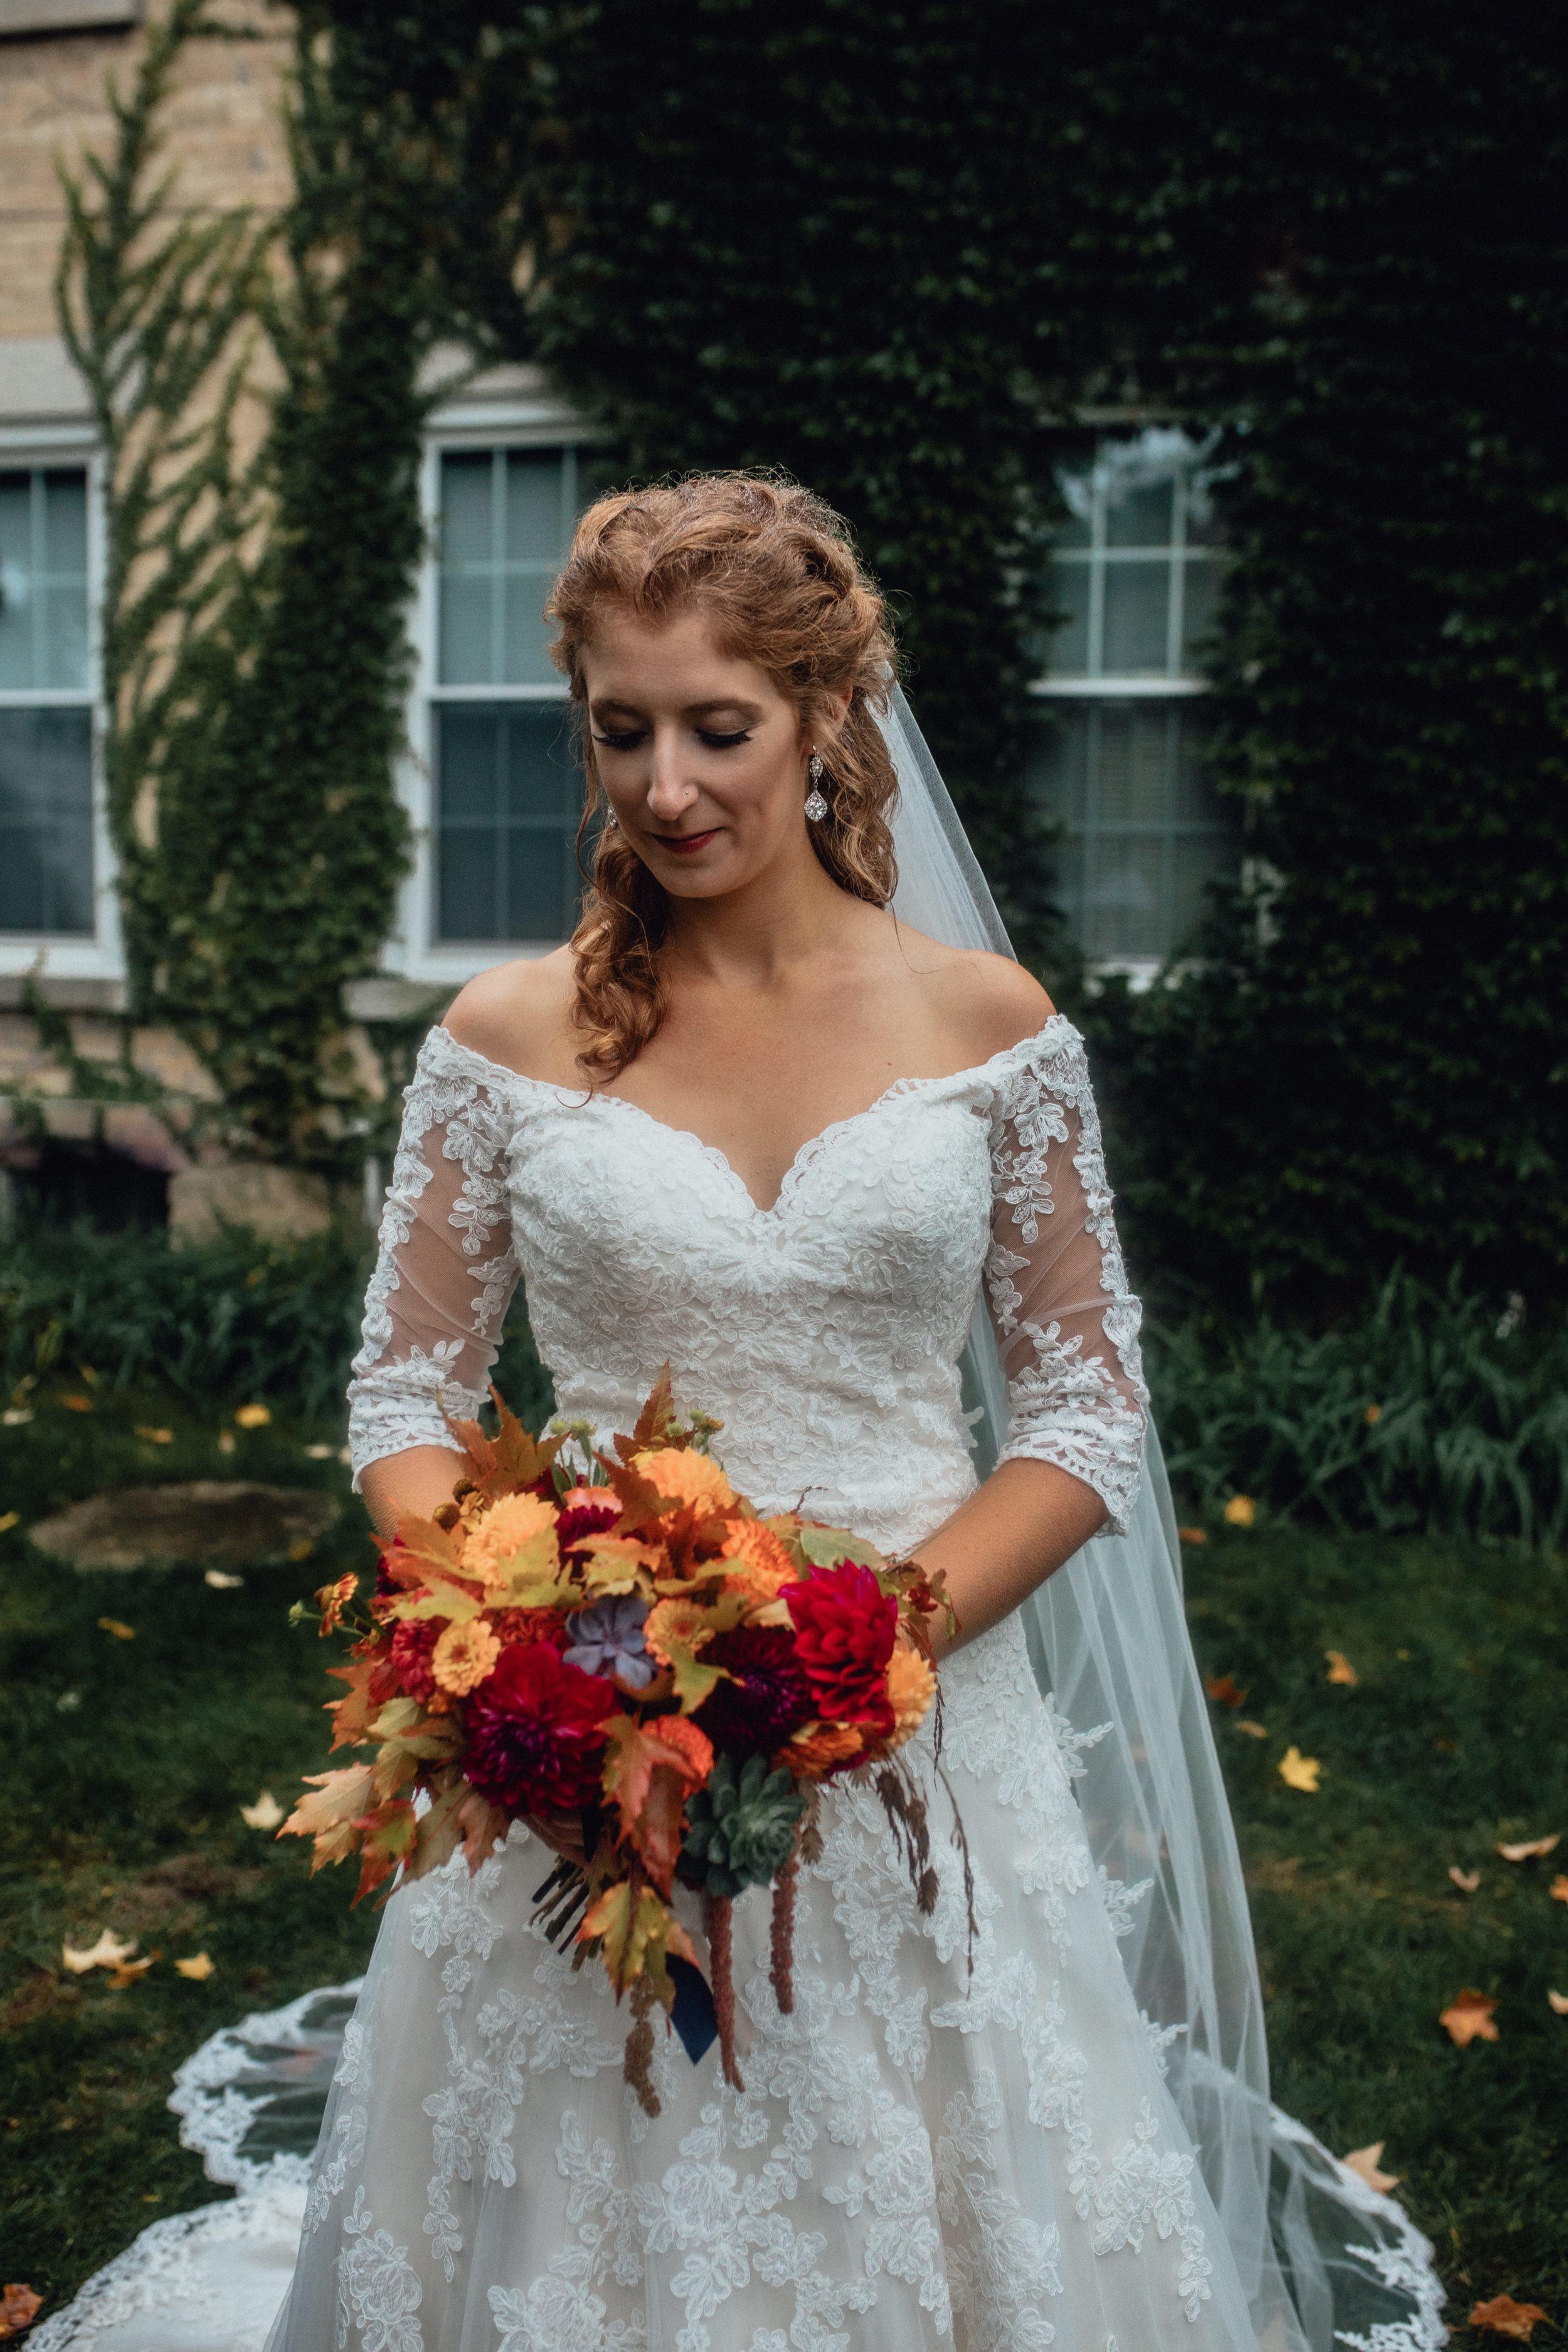 bride-portrait-at-rustic-manor-1848-with-ivy.jpg